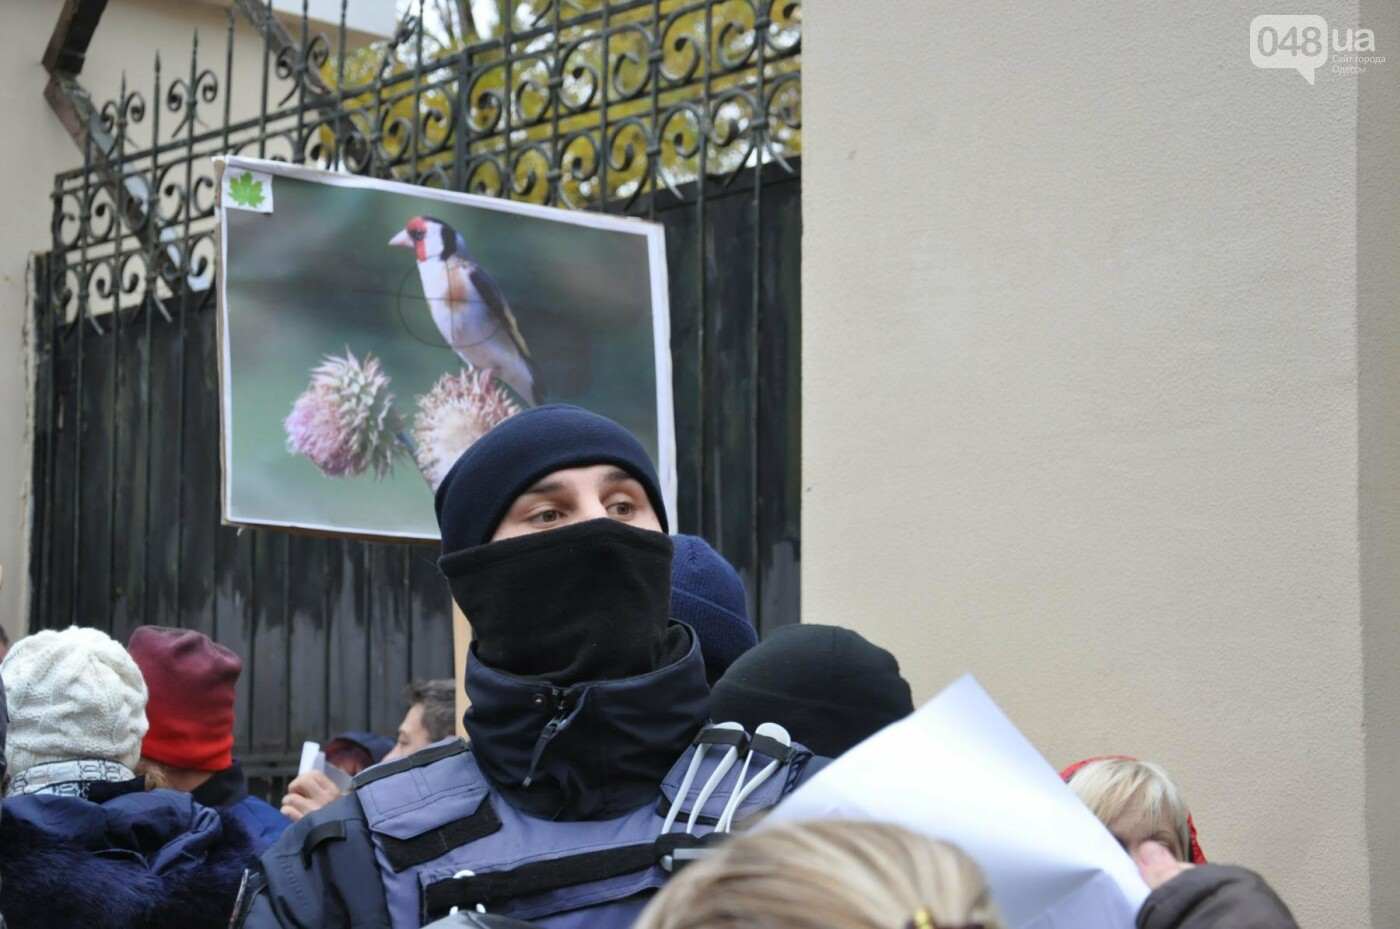 Около 5 сотен одесситов протестовали против застройки Горсада (ФОТО) , фото-8